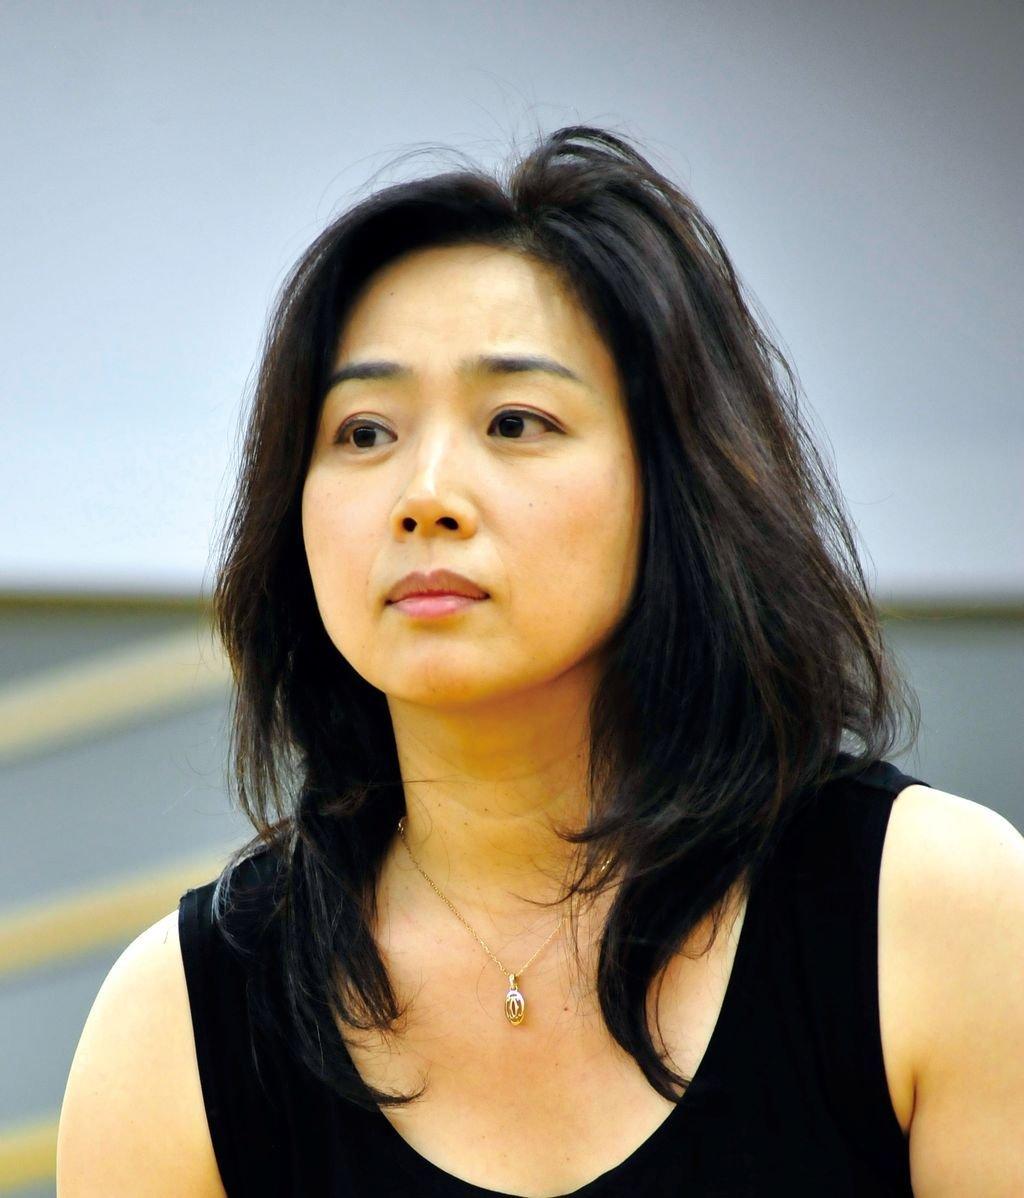 introducing kumiko fujiyoshi14 - 藤吉久美子の魅力と現在の活動をご紹介!